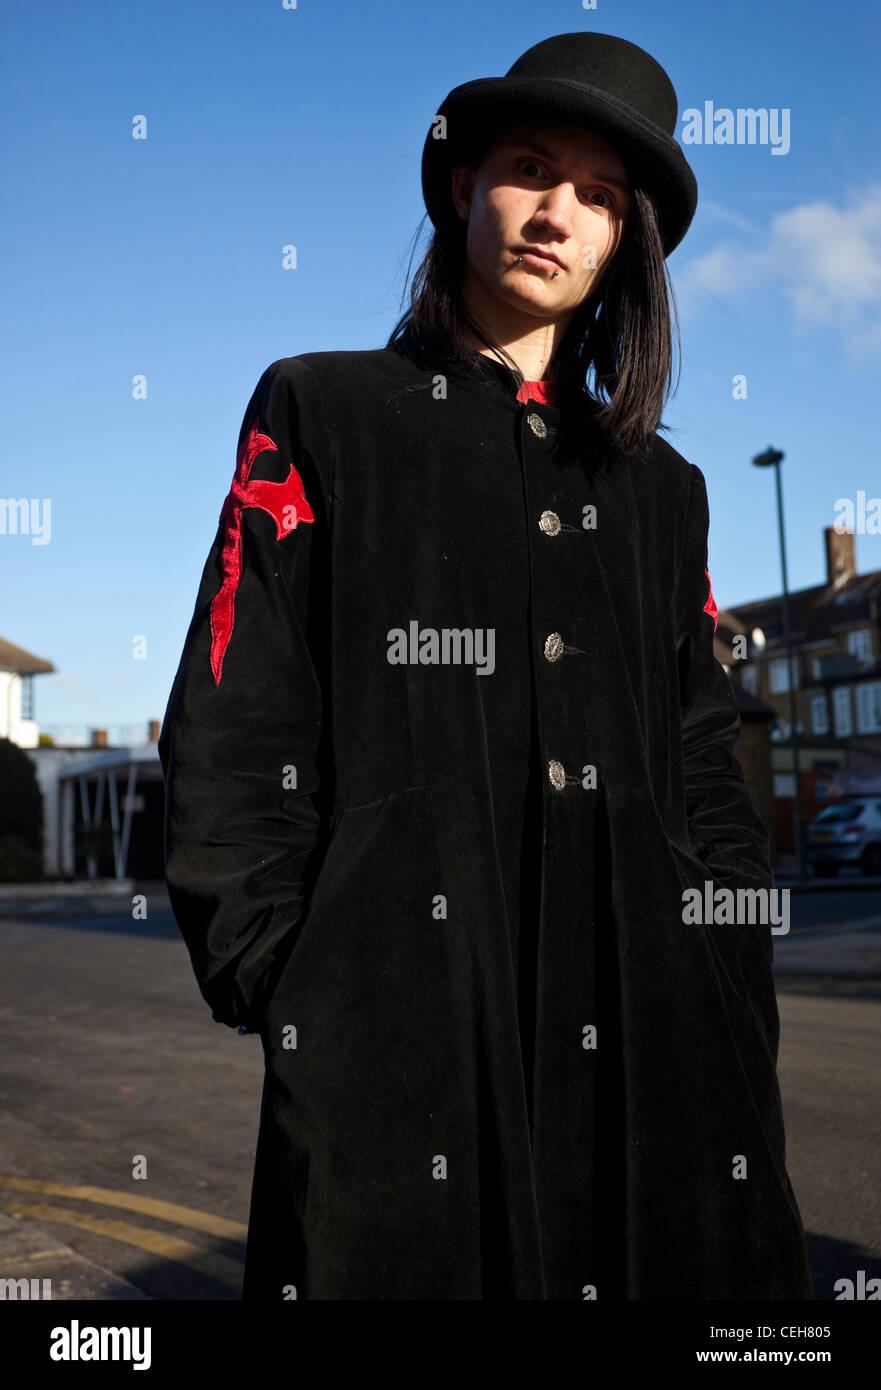 Goth fashion stockfotos goth fashion bilder alamy - Schwarzer langer mantel ...